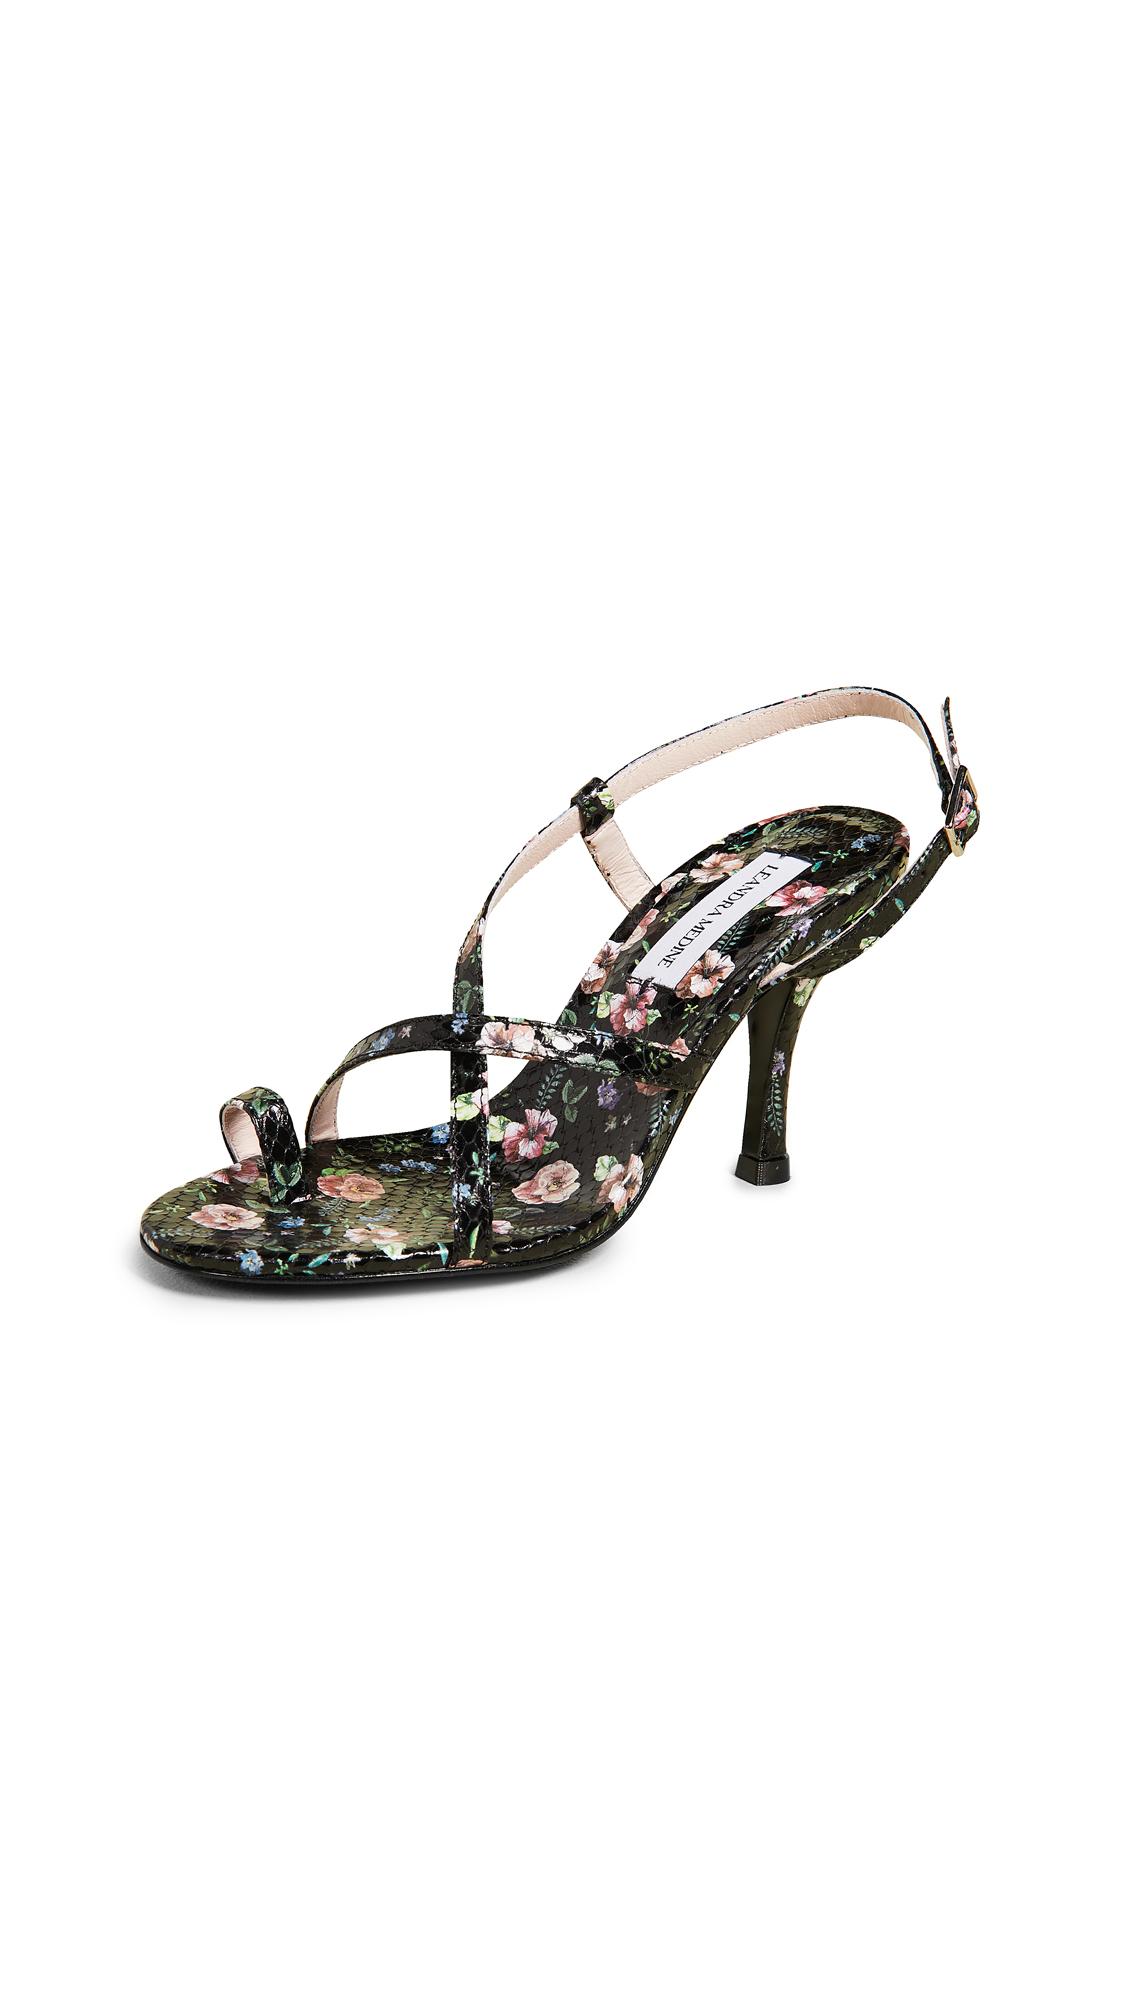 Leandra Medine High Strap Sandals - Black